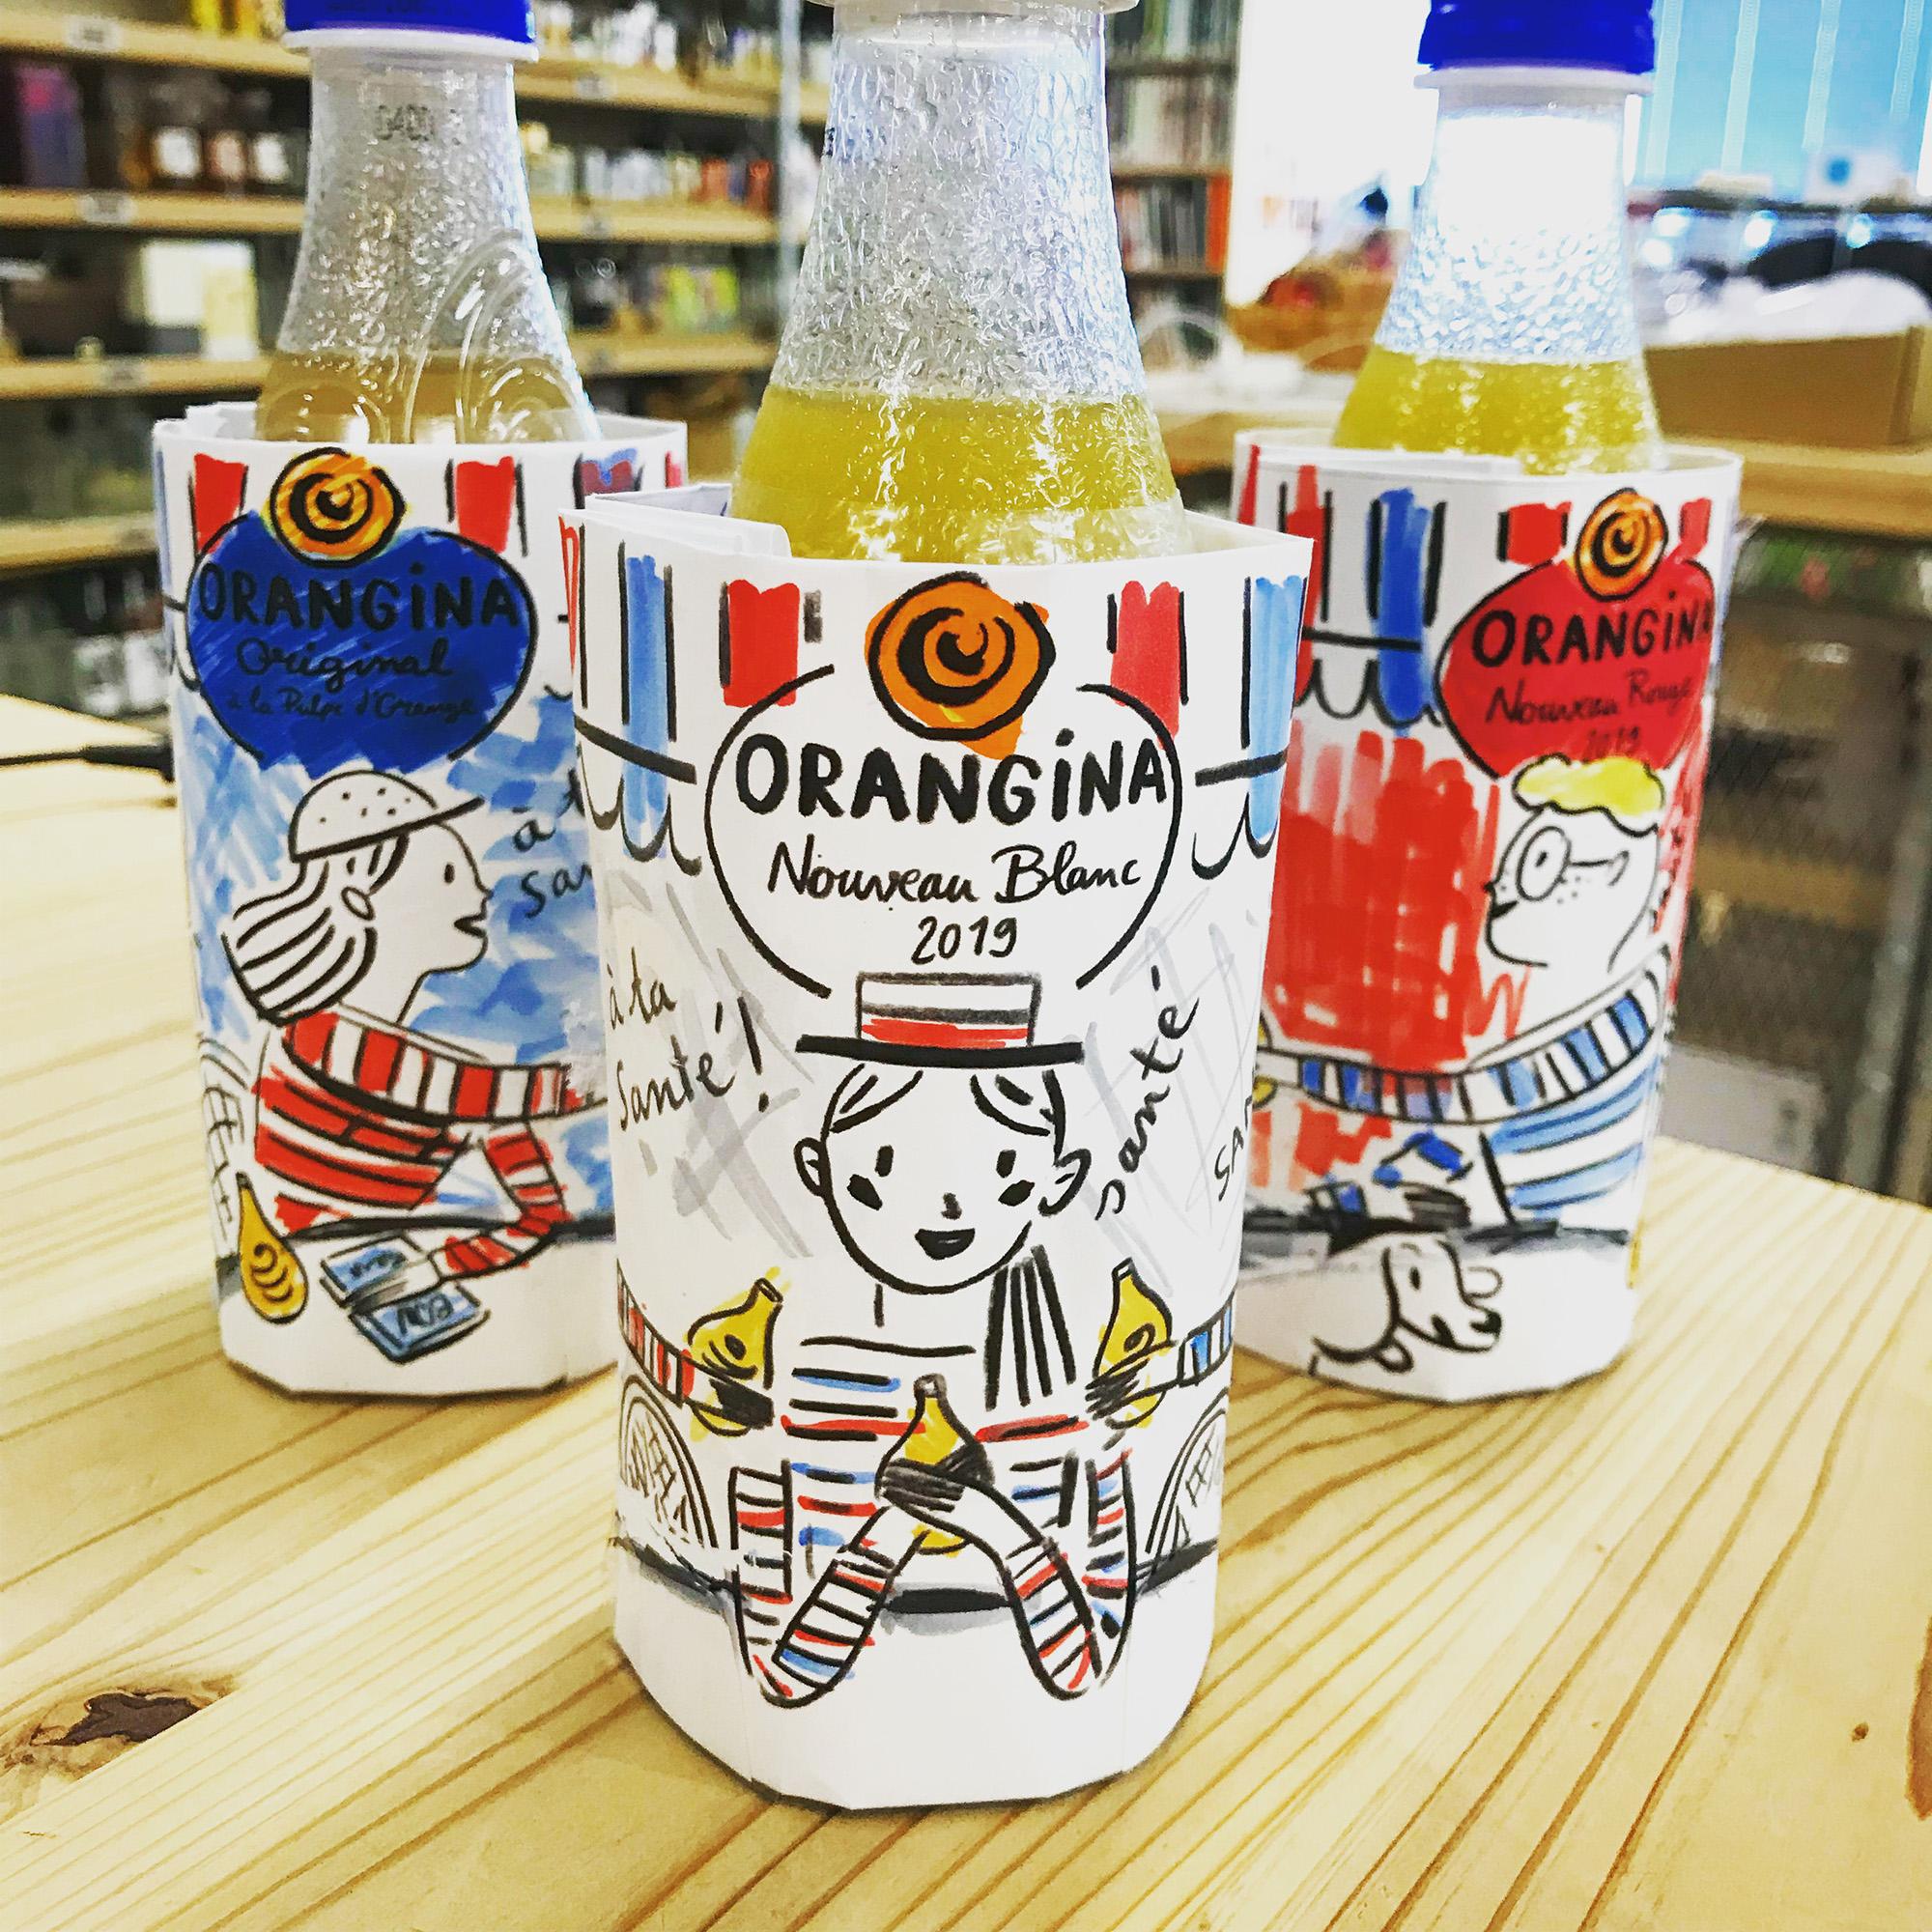 Orangina Beaujolais Nouveau Limited Edition 2019 – Cheers Bottle